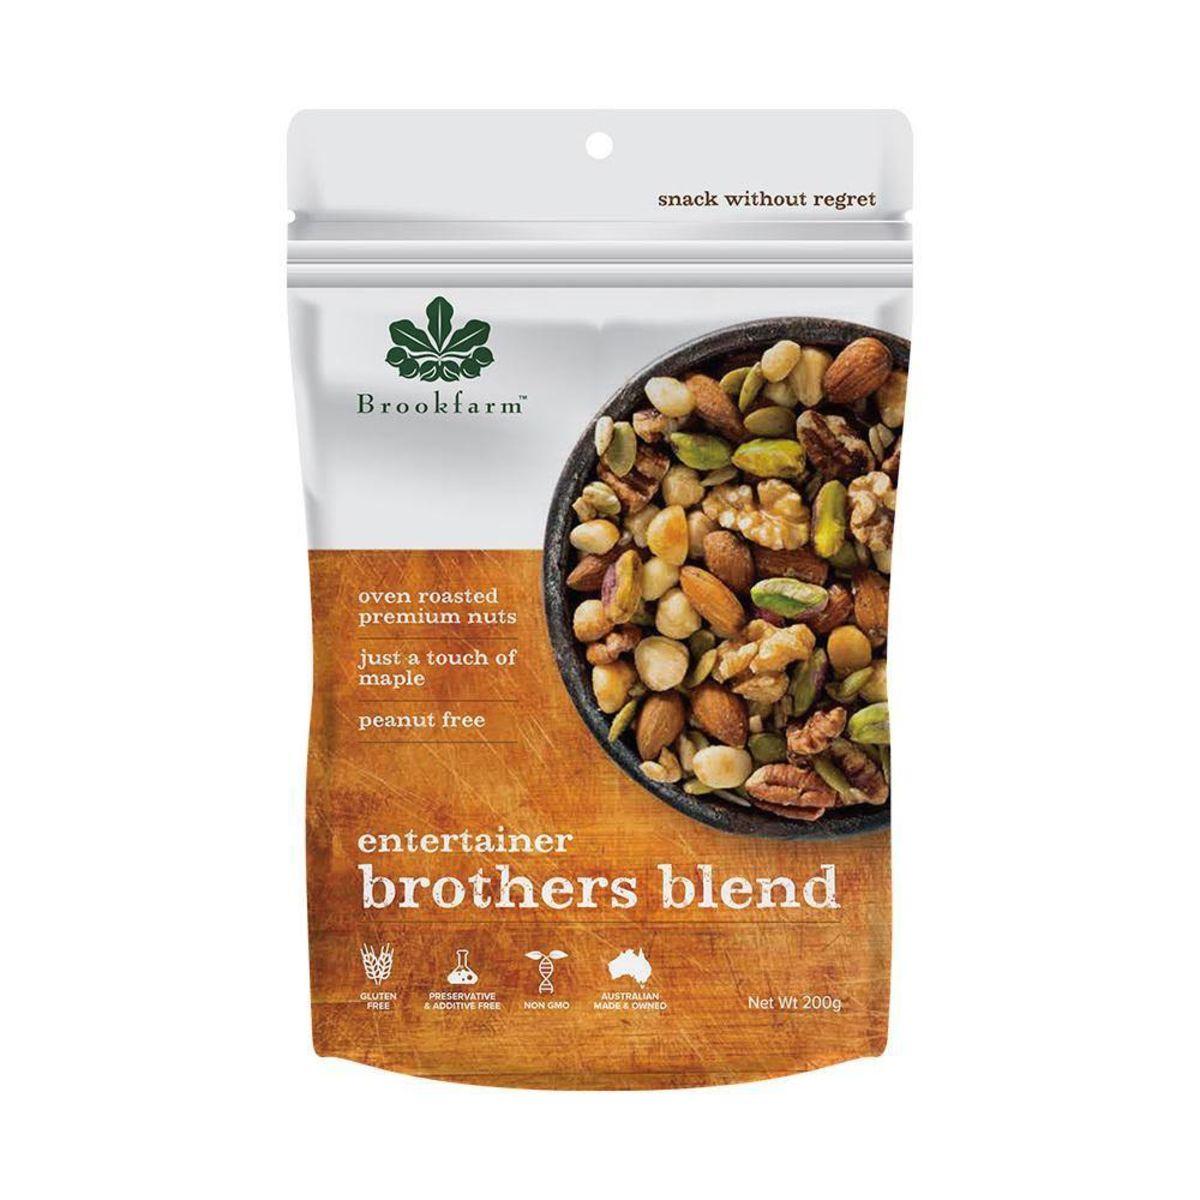 Brookfarm - Brothers Blend - Entertainer Mix